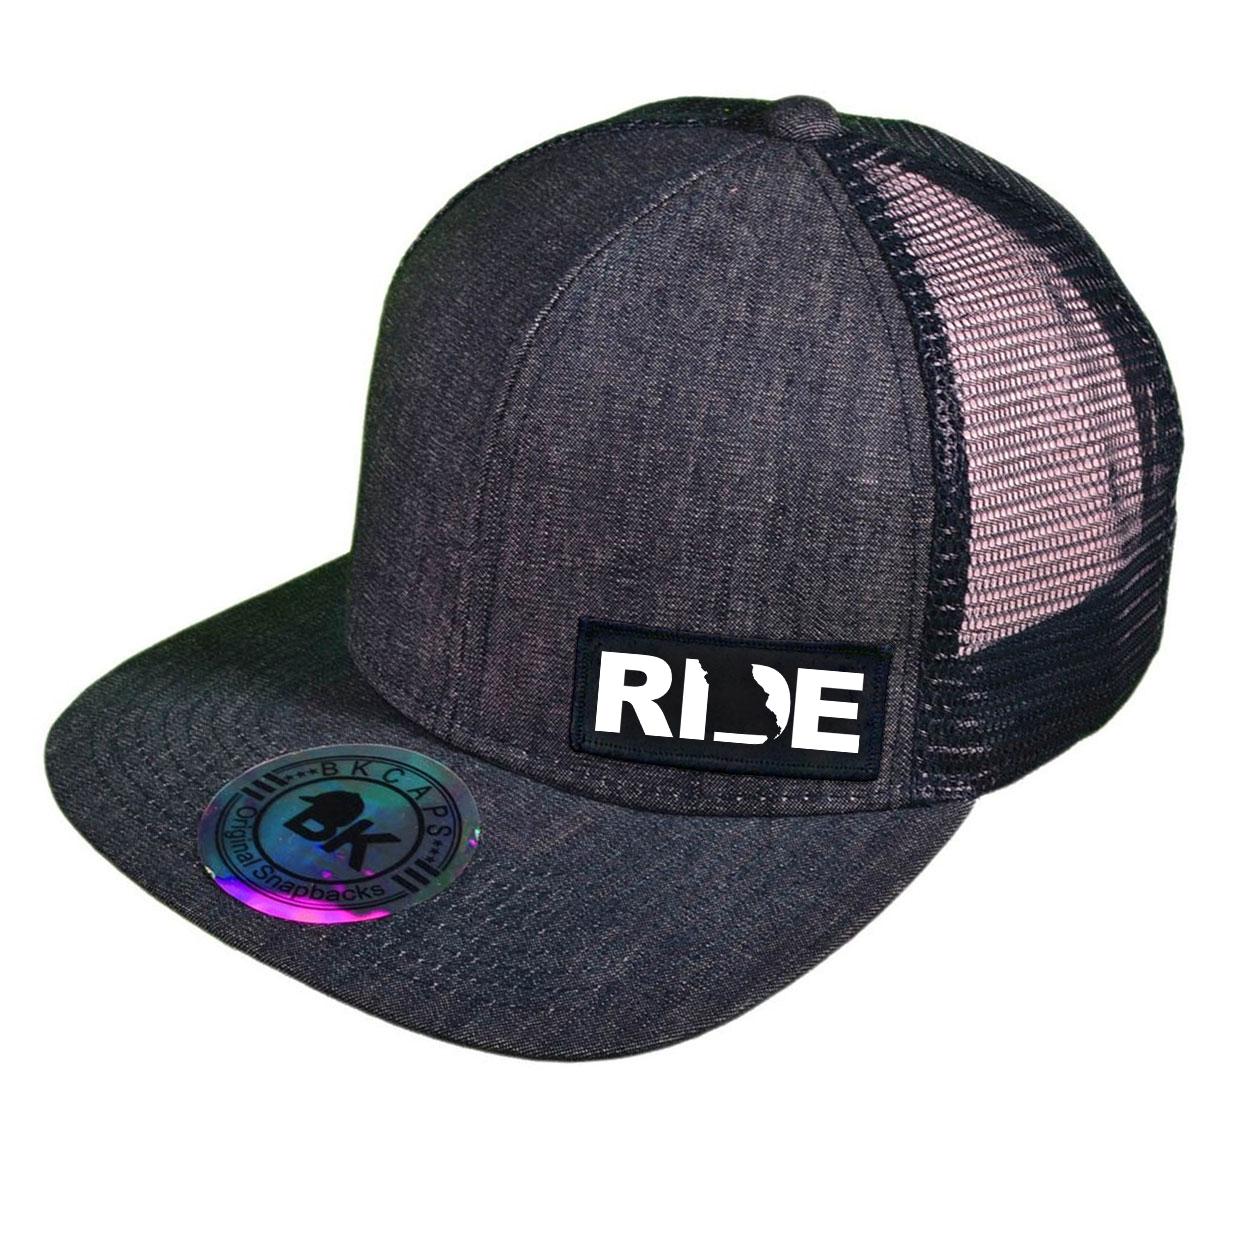 Ride Missouri Night Out Woven Patch Snapback Flat Brim Hat Dark Navy Denim (White Logo)